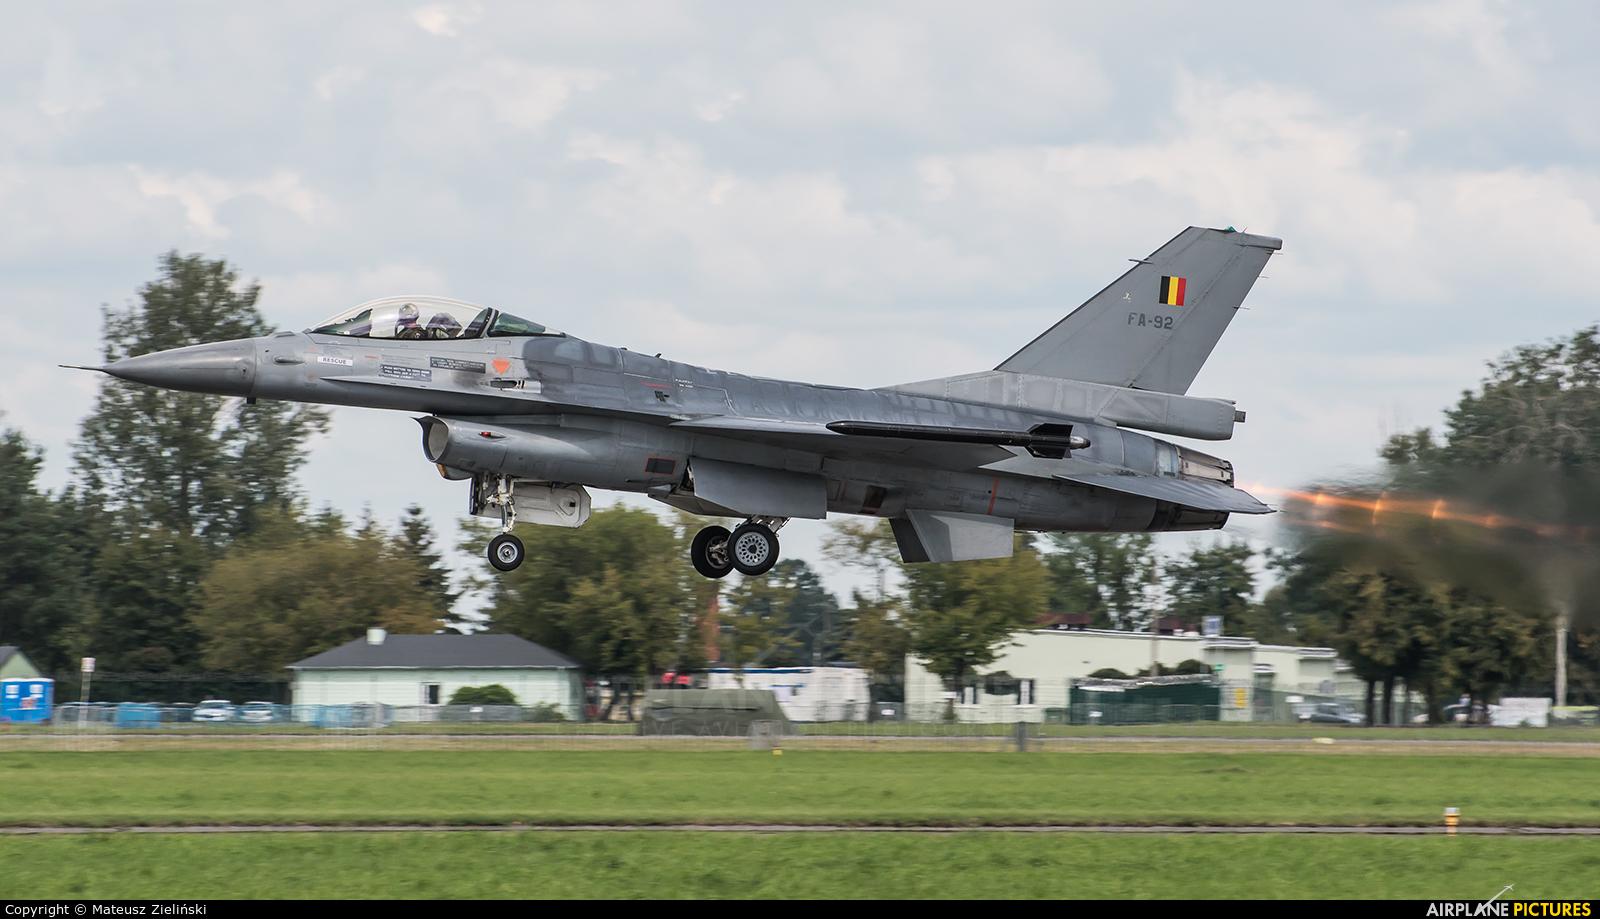 Belgium - Air Force FA-92 aircraft at Radom - Sadków